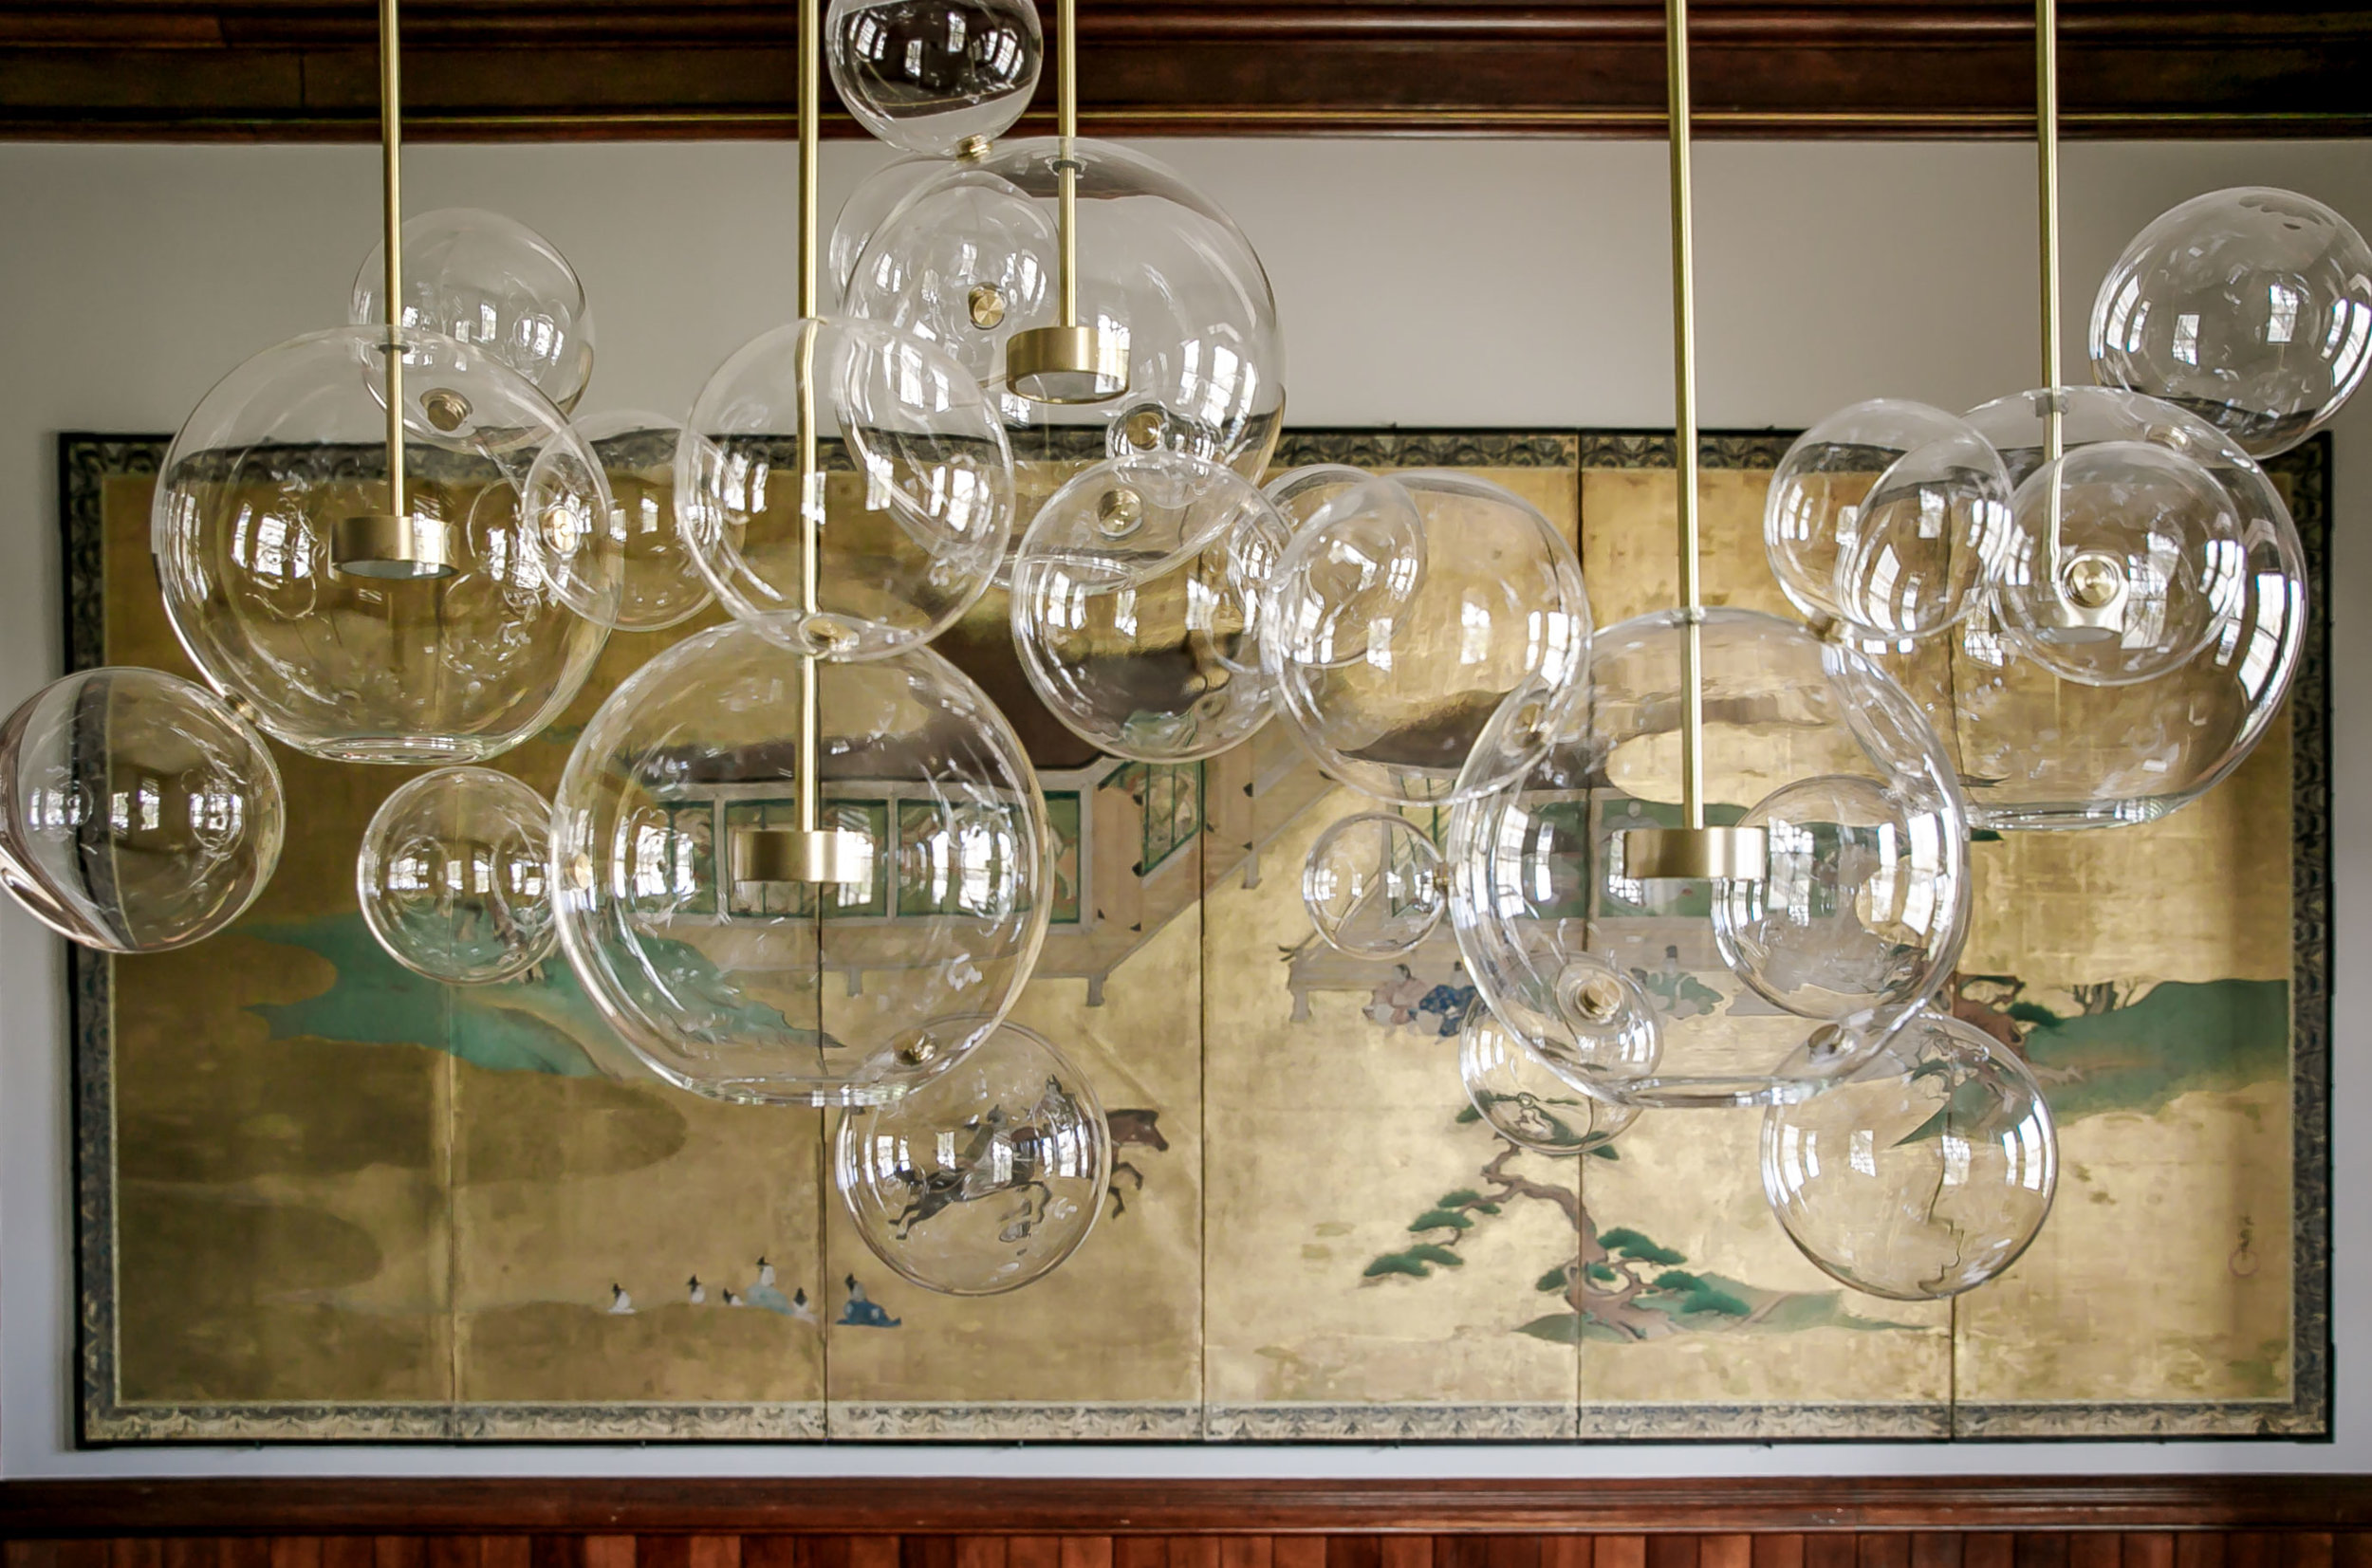 glass-ball-chandelier-cropped.jpg